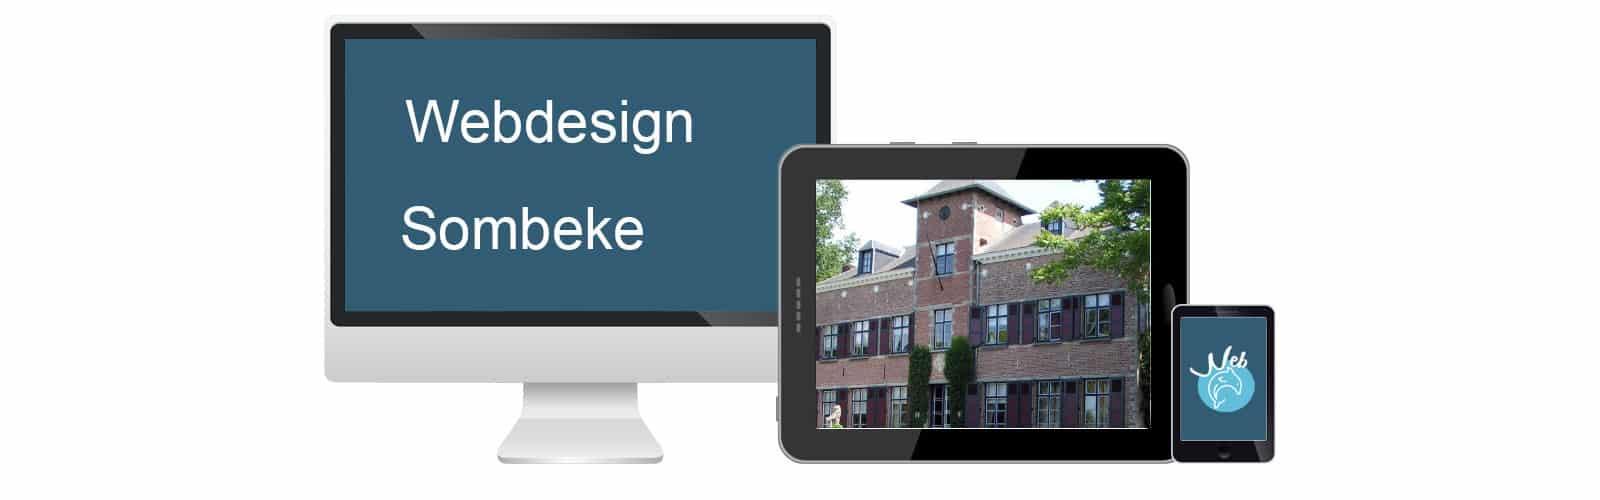 Webdesign Sombeke - webdolfijn